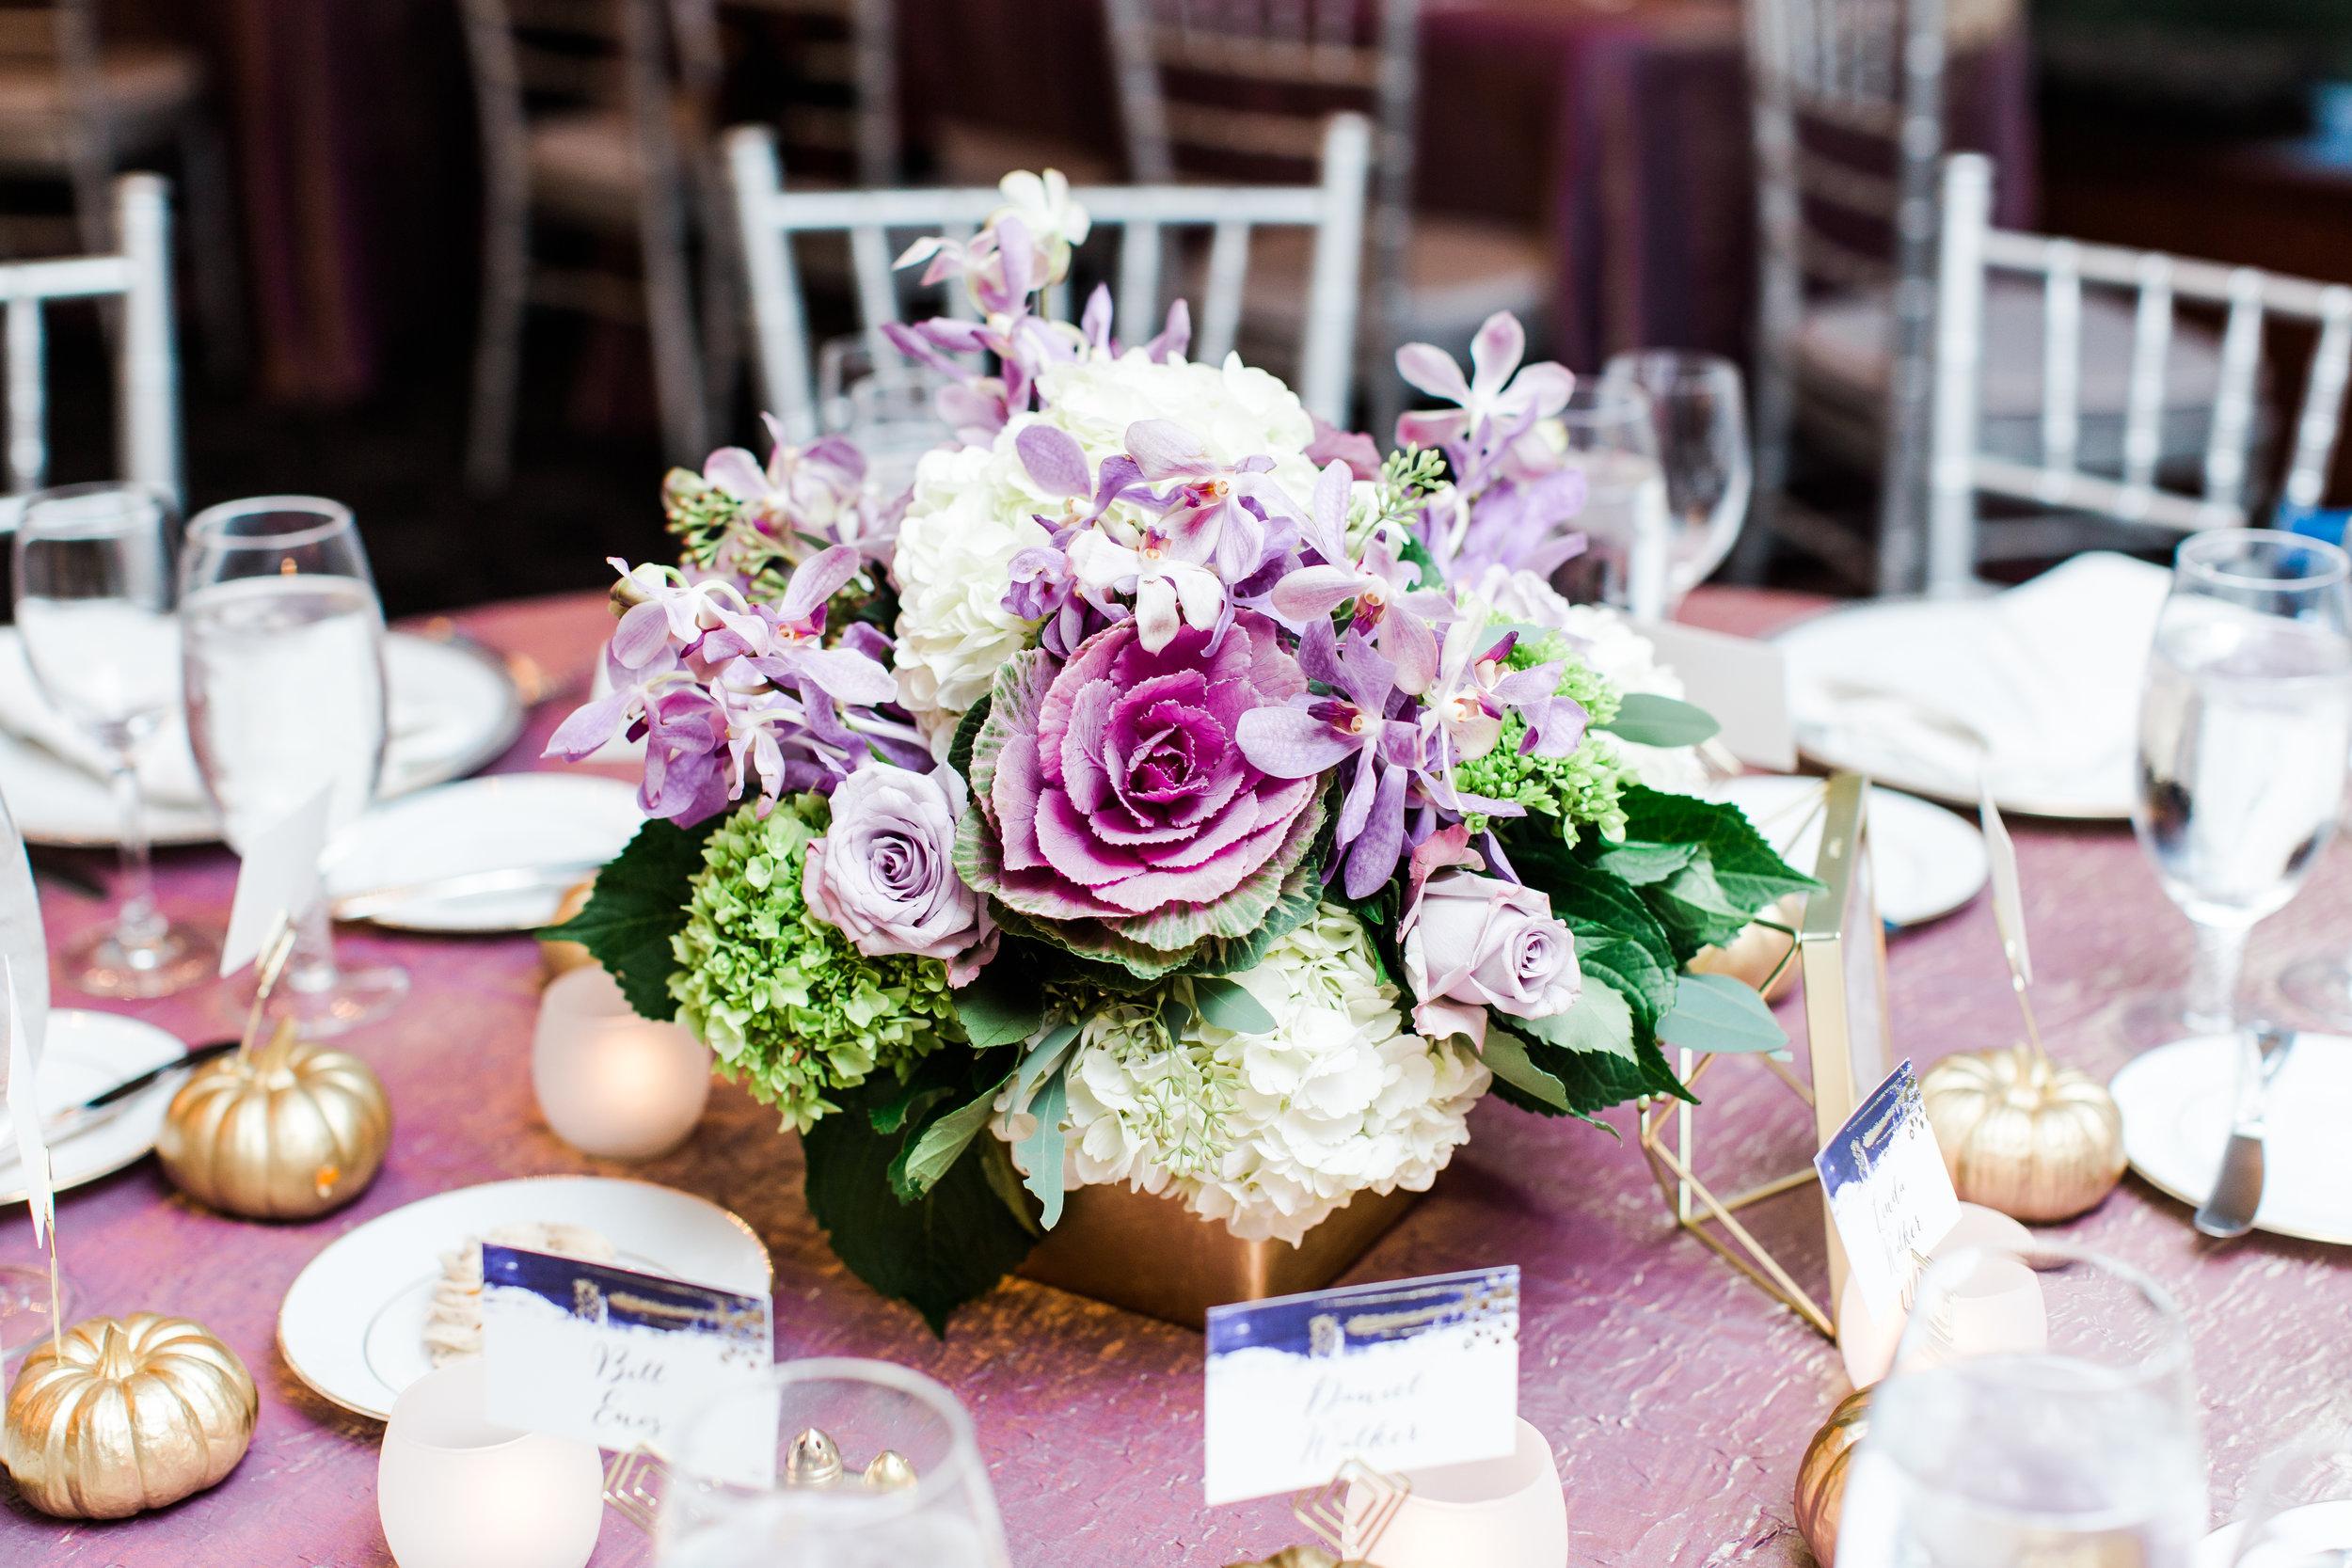 DavidAmandaMundy-Wedding-10282017-KathrynIvyPhotography-420.jpg